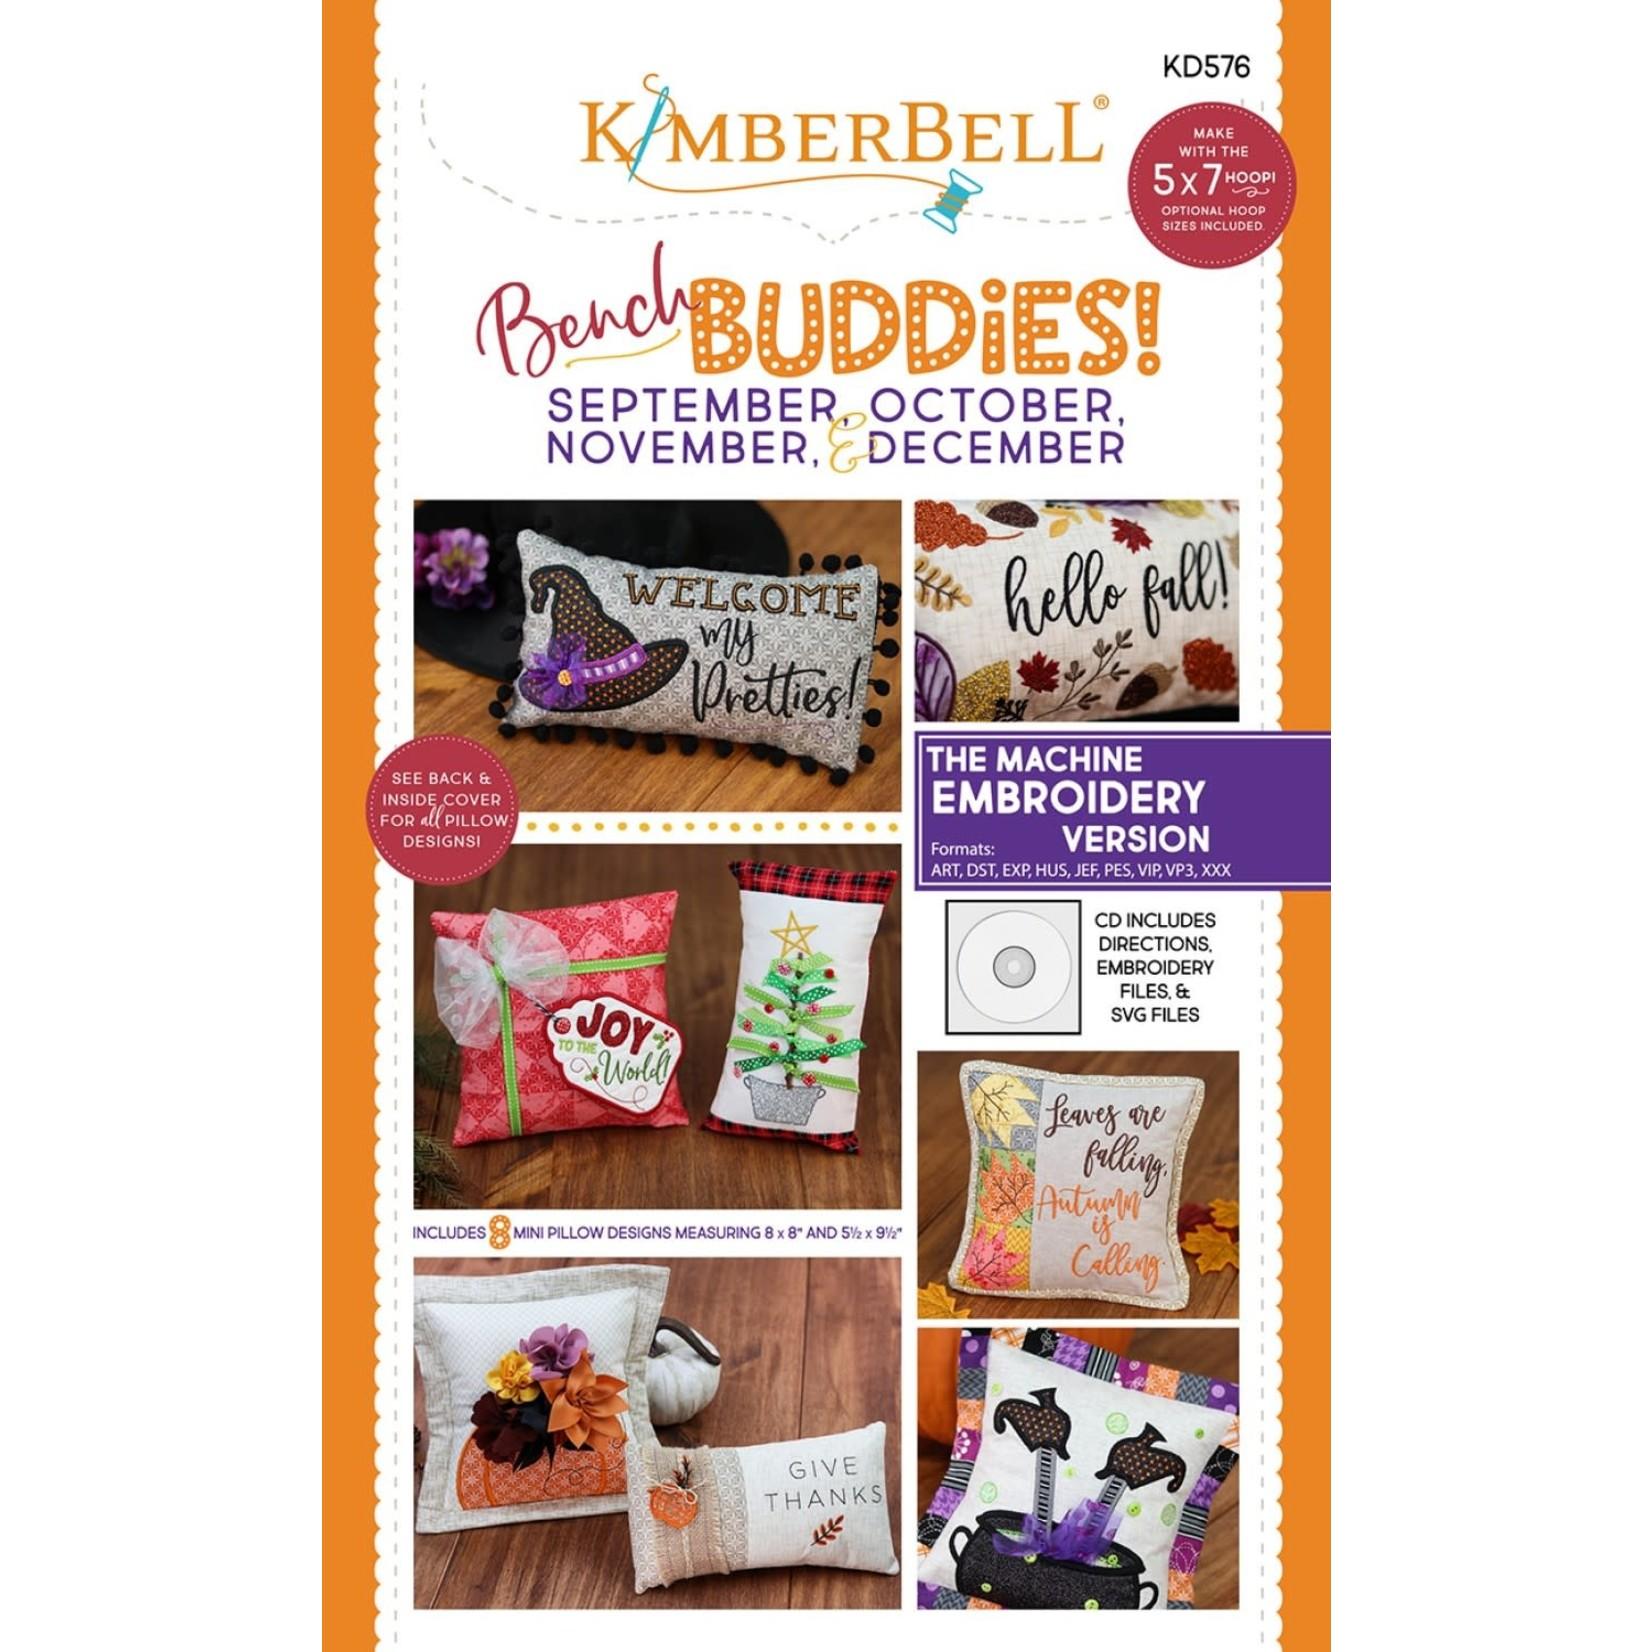 Kimberbell Designs Bench Buddies:  September, October, November, December (Machine Embroidery Version)